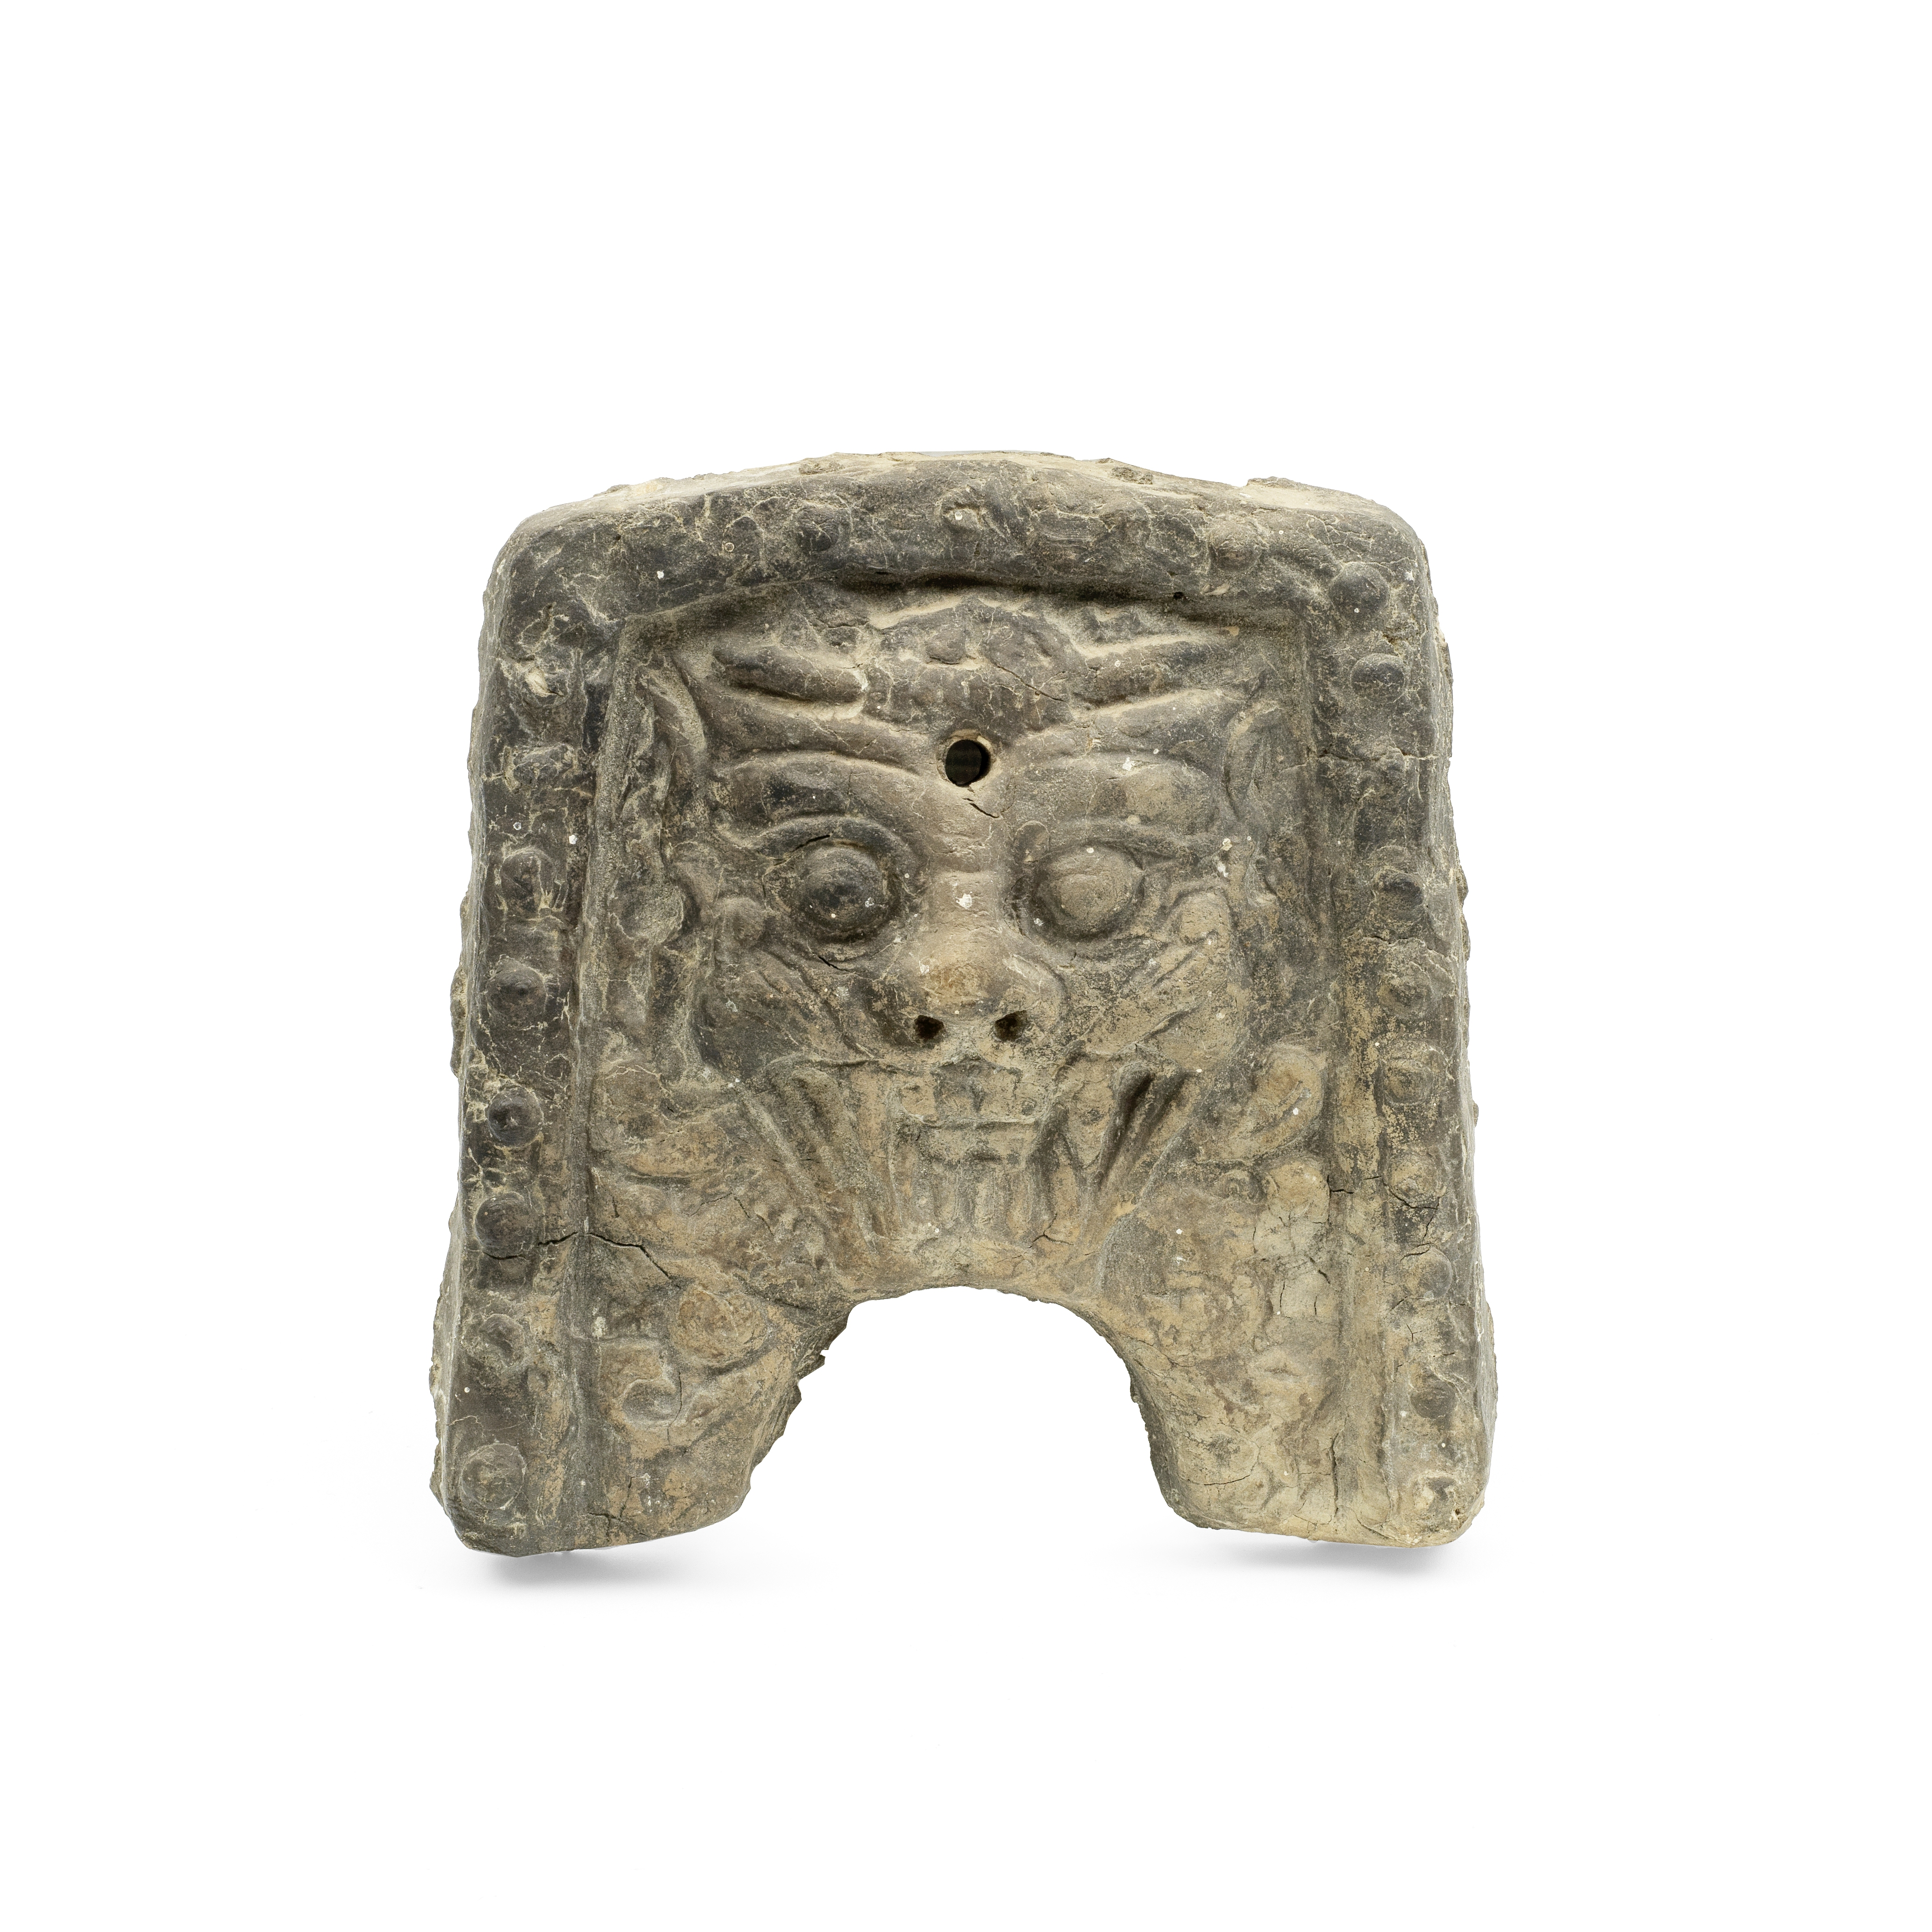 A MOULDED CERAMIC TILE Korea, probably Silla Dynasty